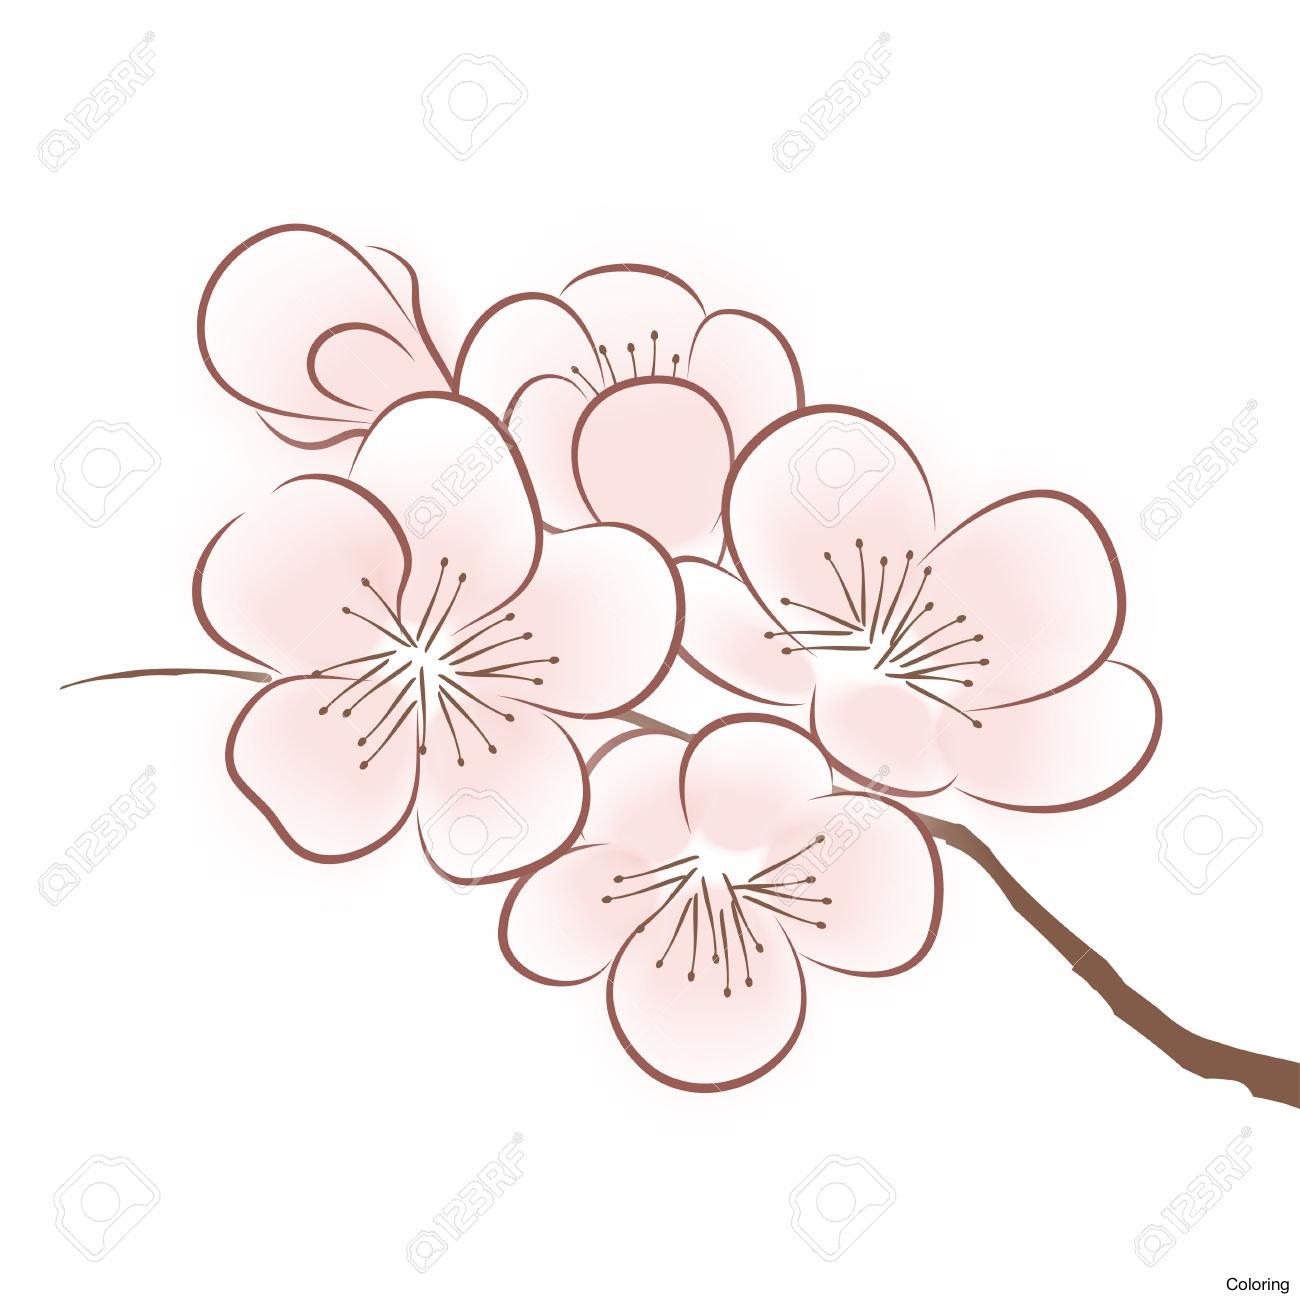 1300x1300 Sakura Flower Draw Drawn Cherry Blossom Japanese Plant 6 Blossoms